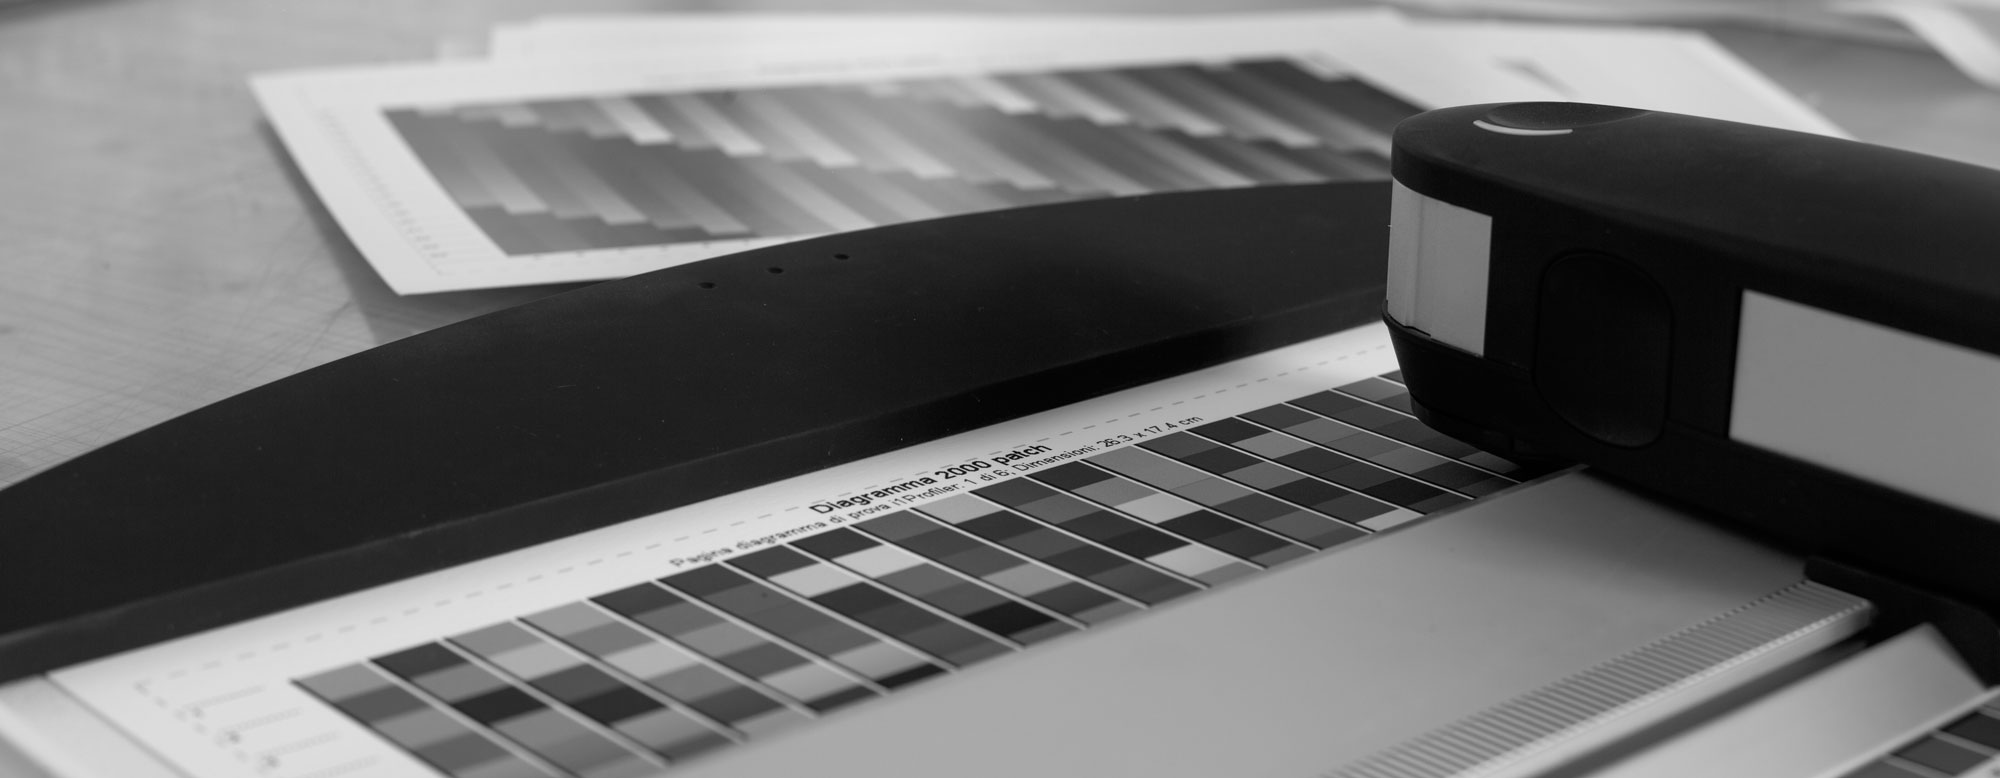 FINE ART LAB – Stampa / Allestimento / PostProduzione